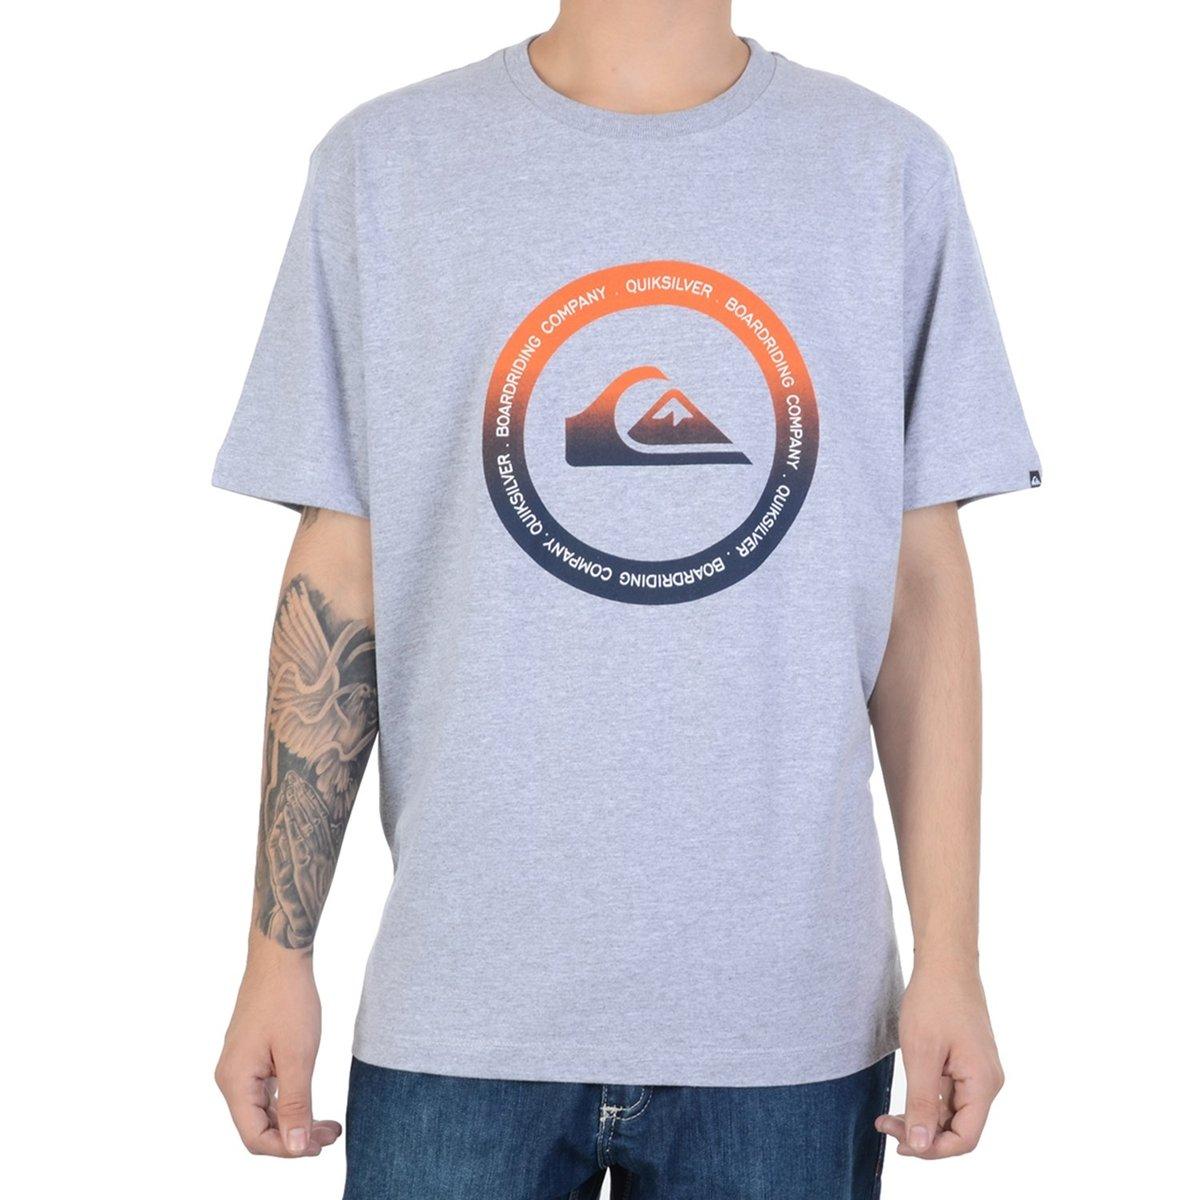 Camiseta Quiksilver Kahu - Compre Agora   Zattini 09139dc348